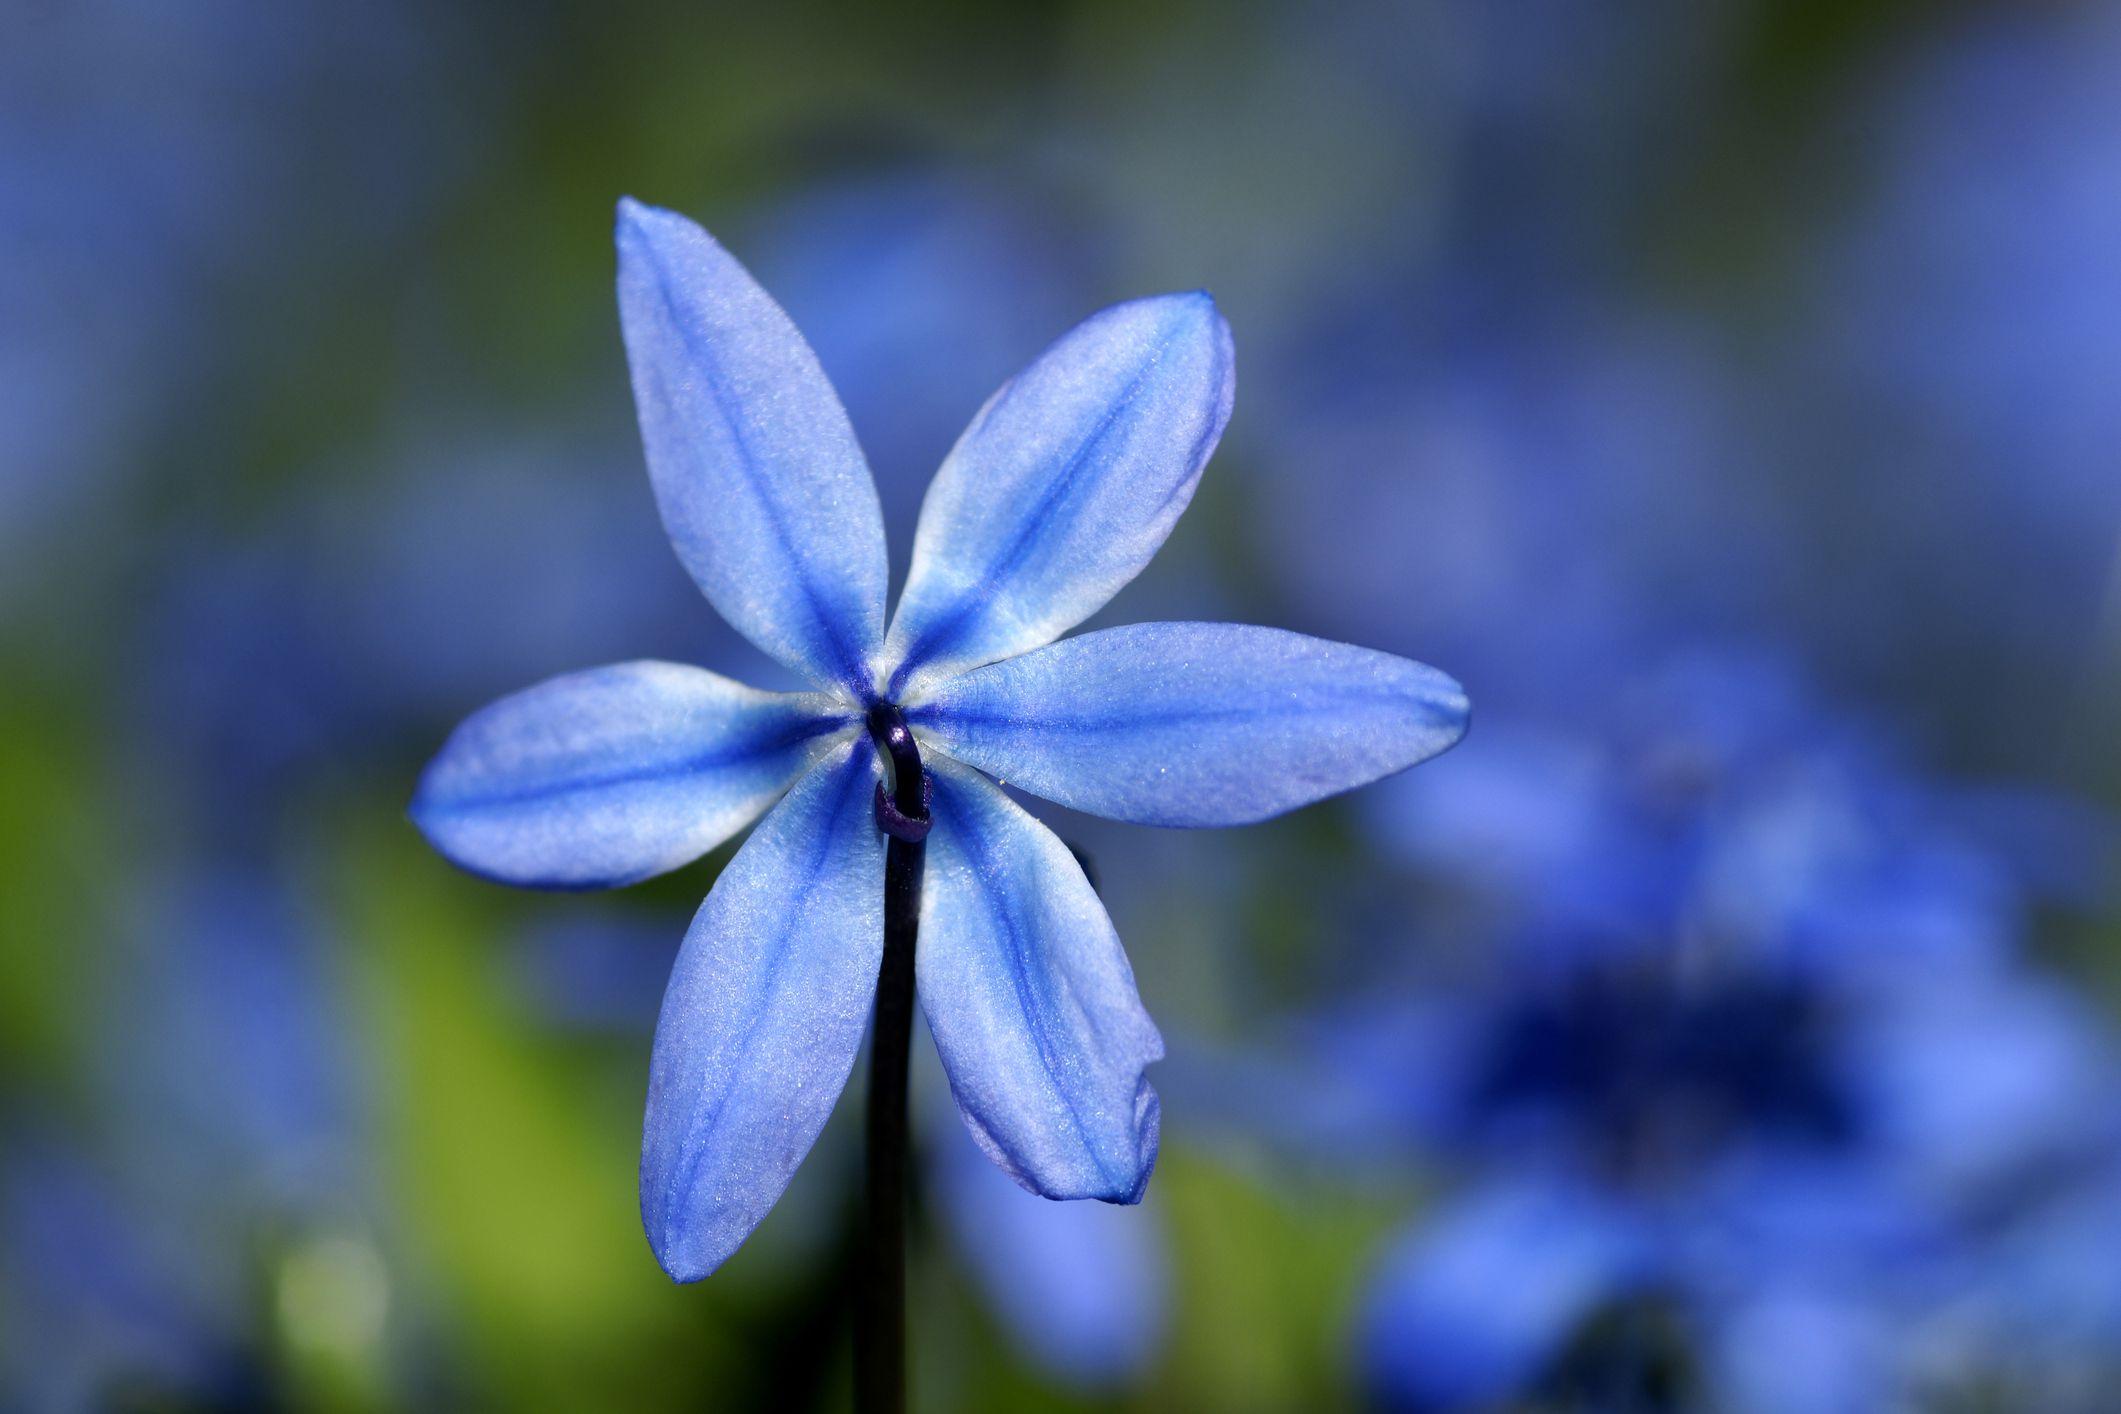 The Earliest Flowers To Bloom In Spring